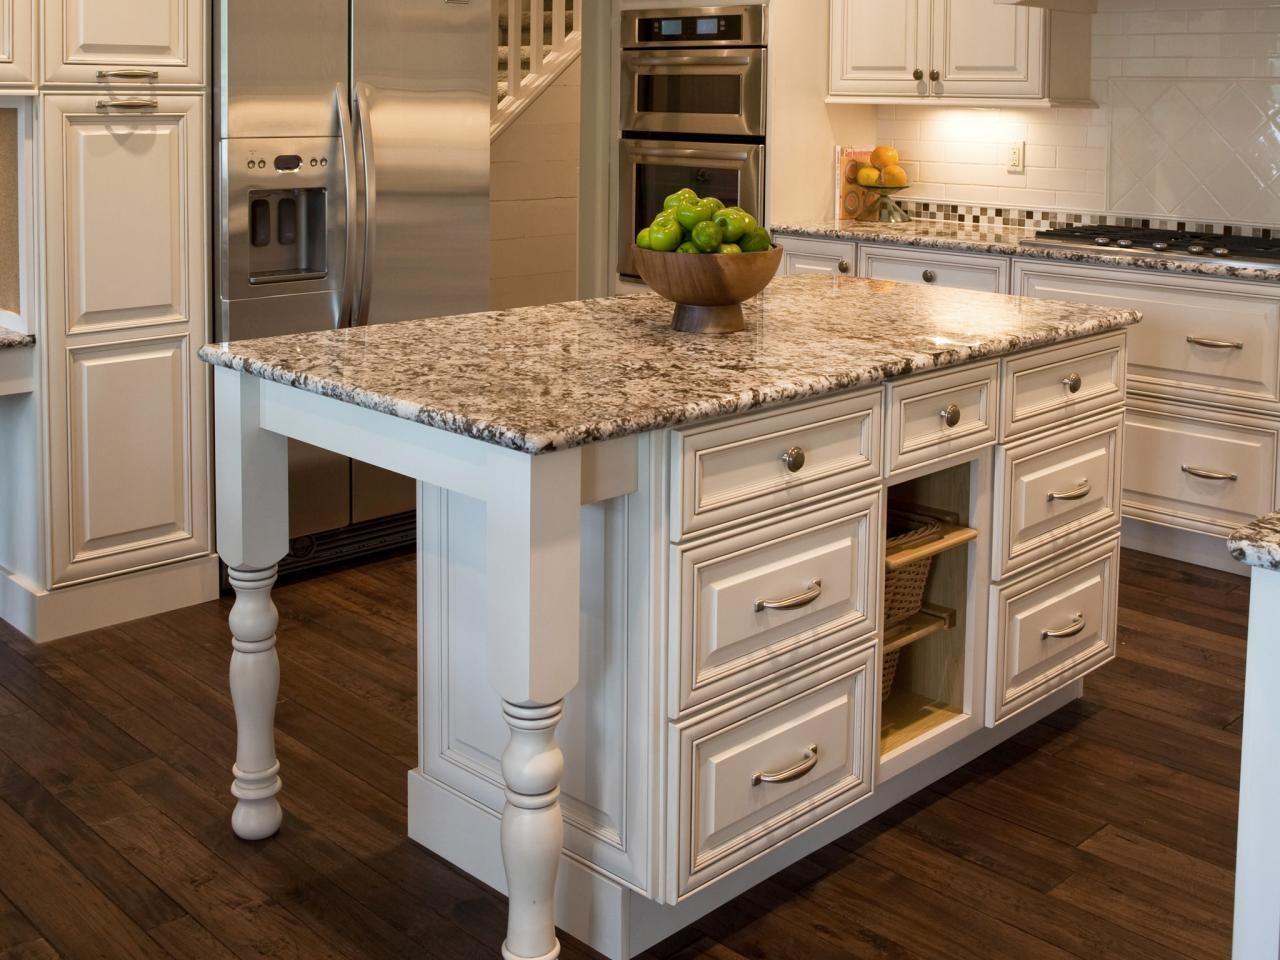 Center Island Designs For Kitchens Prepossessing Dream Home 2016 Pool  Granite Countertops Granite Tops And Granite Design Decoration